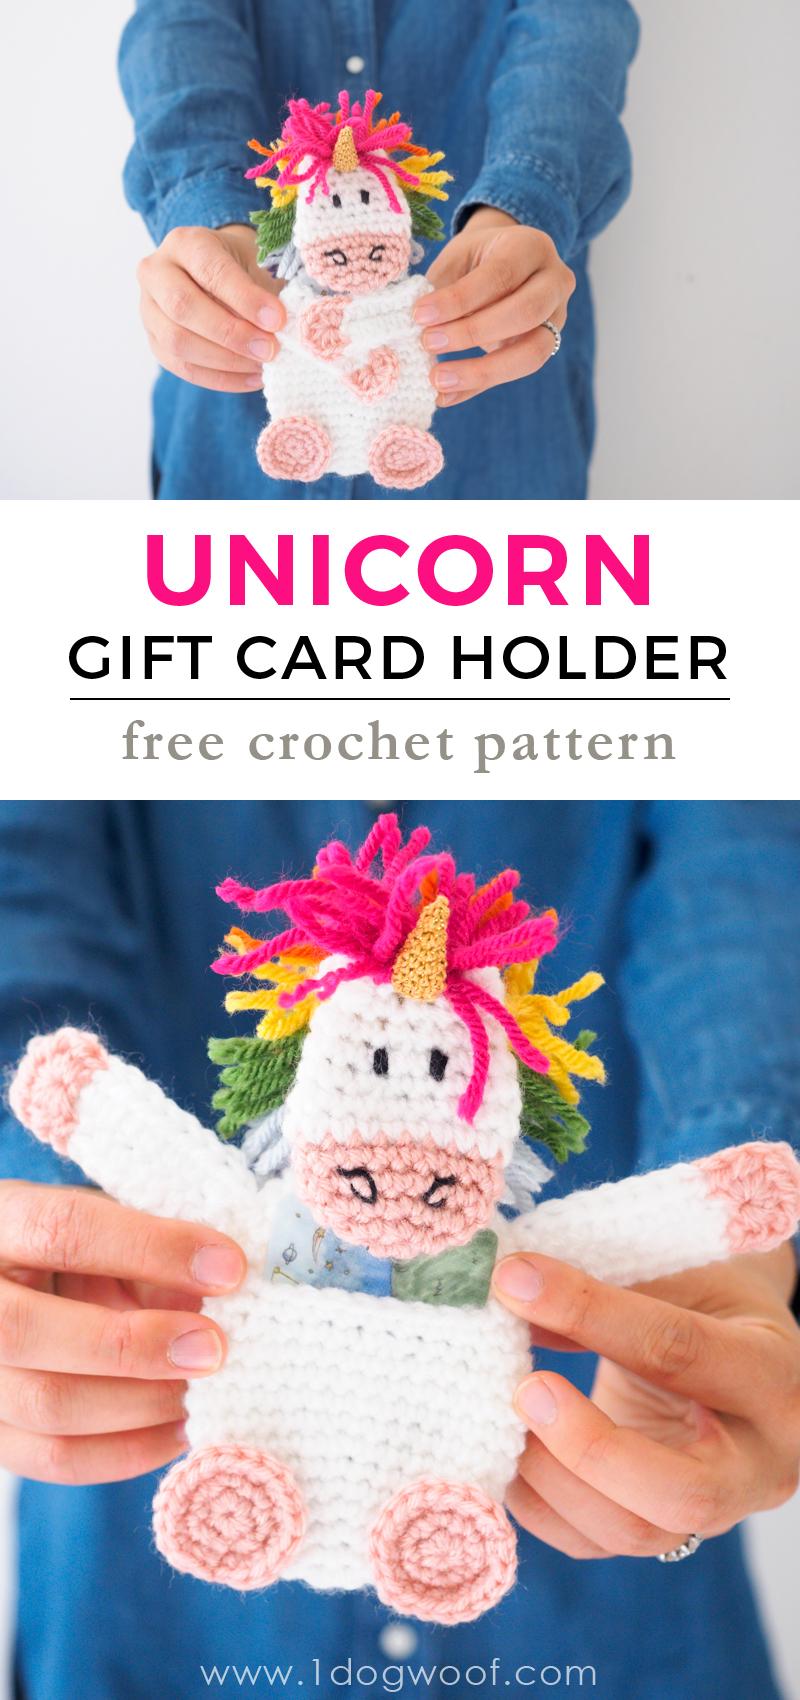 Crochet unicorn gift card holder - to make any gift spectacular! Free crochet pattern at www.1dogwoof.com